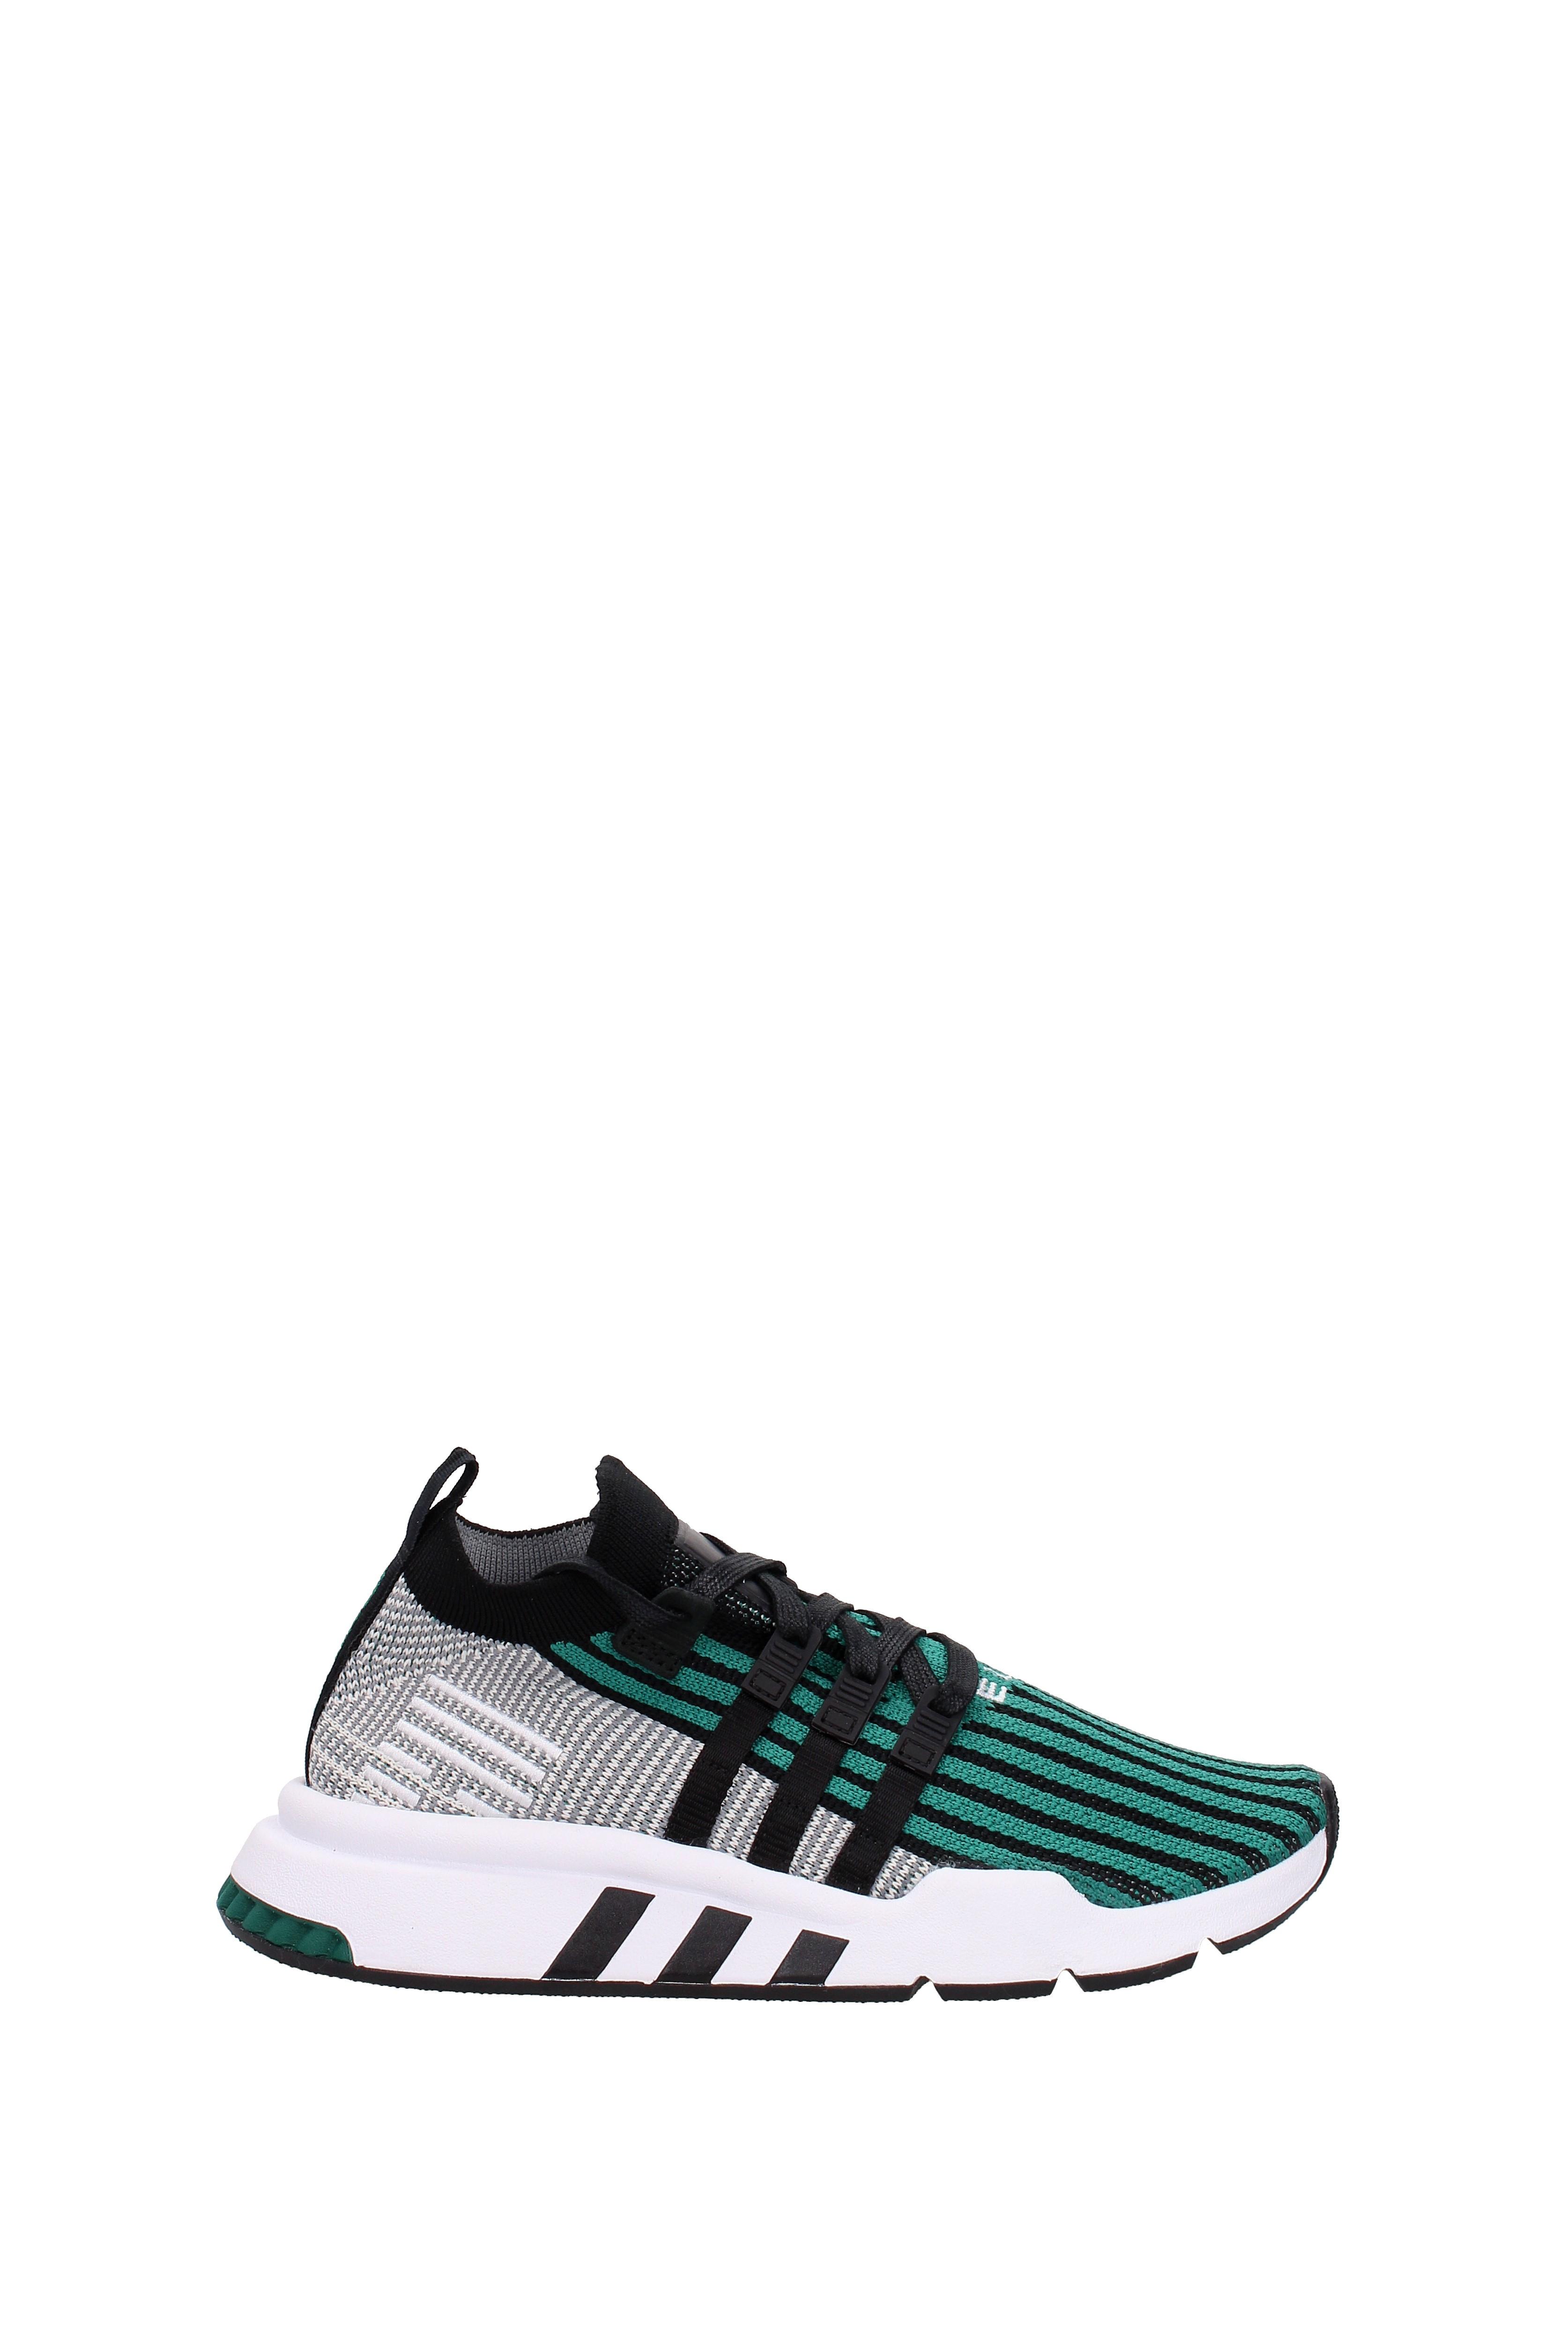 da ginnastica Adidas EQT Sostegno Mid Mid Sostegno ADV PK Uomo-tessuto (eqtsupportmidcq 299) 316dda